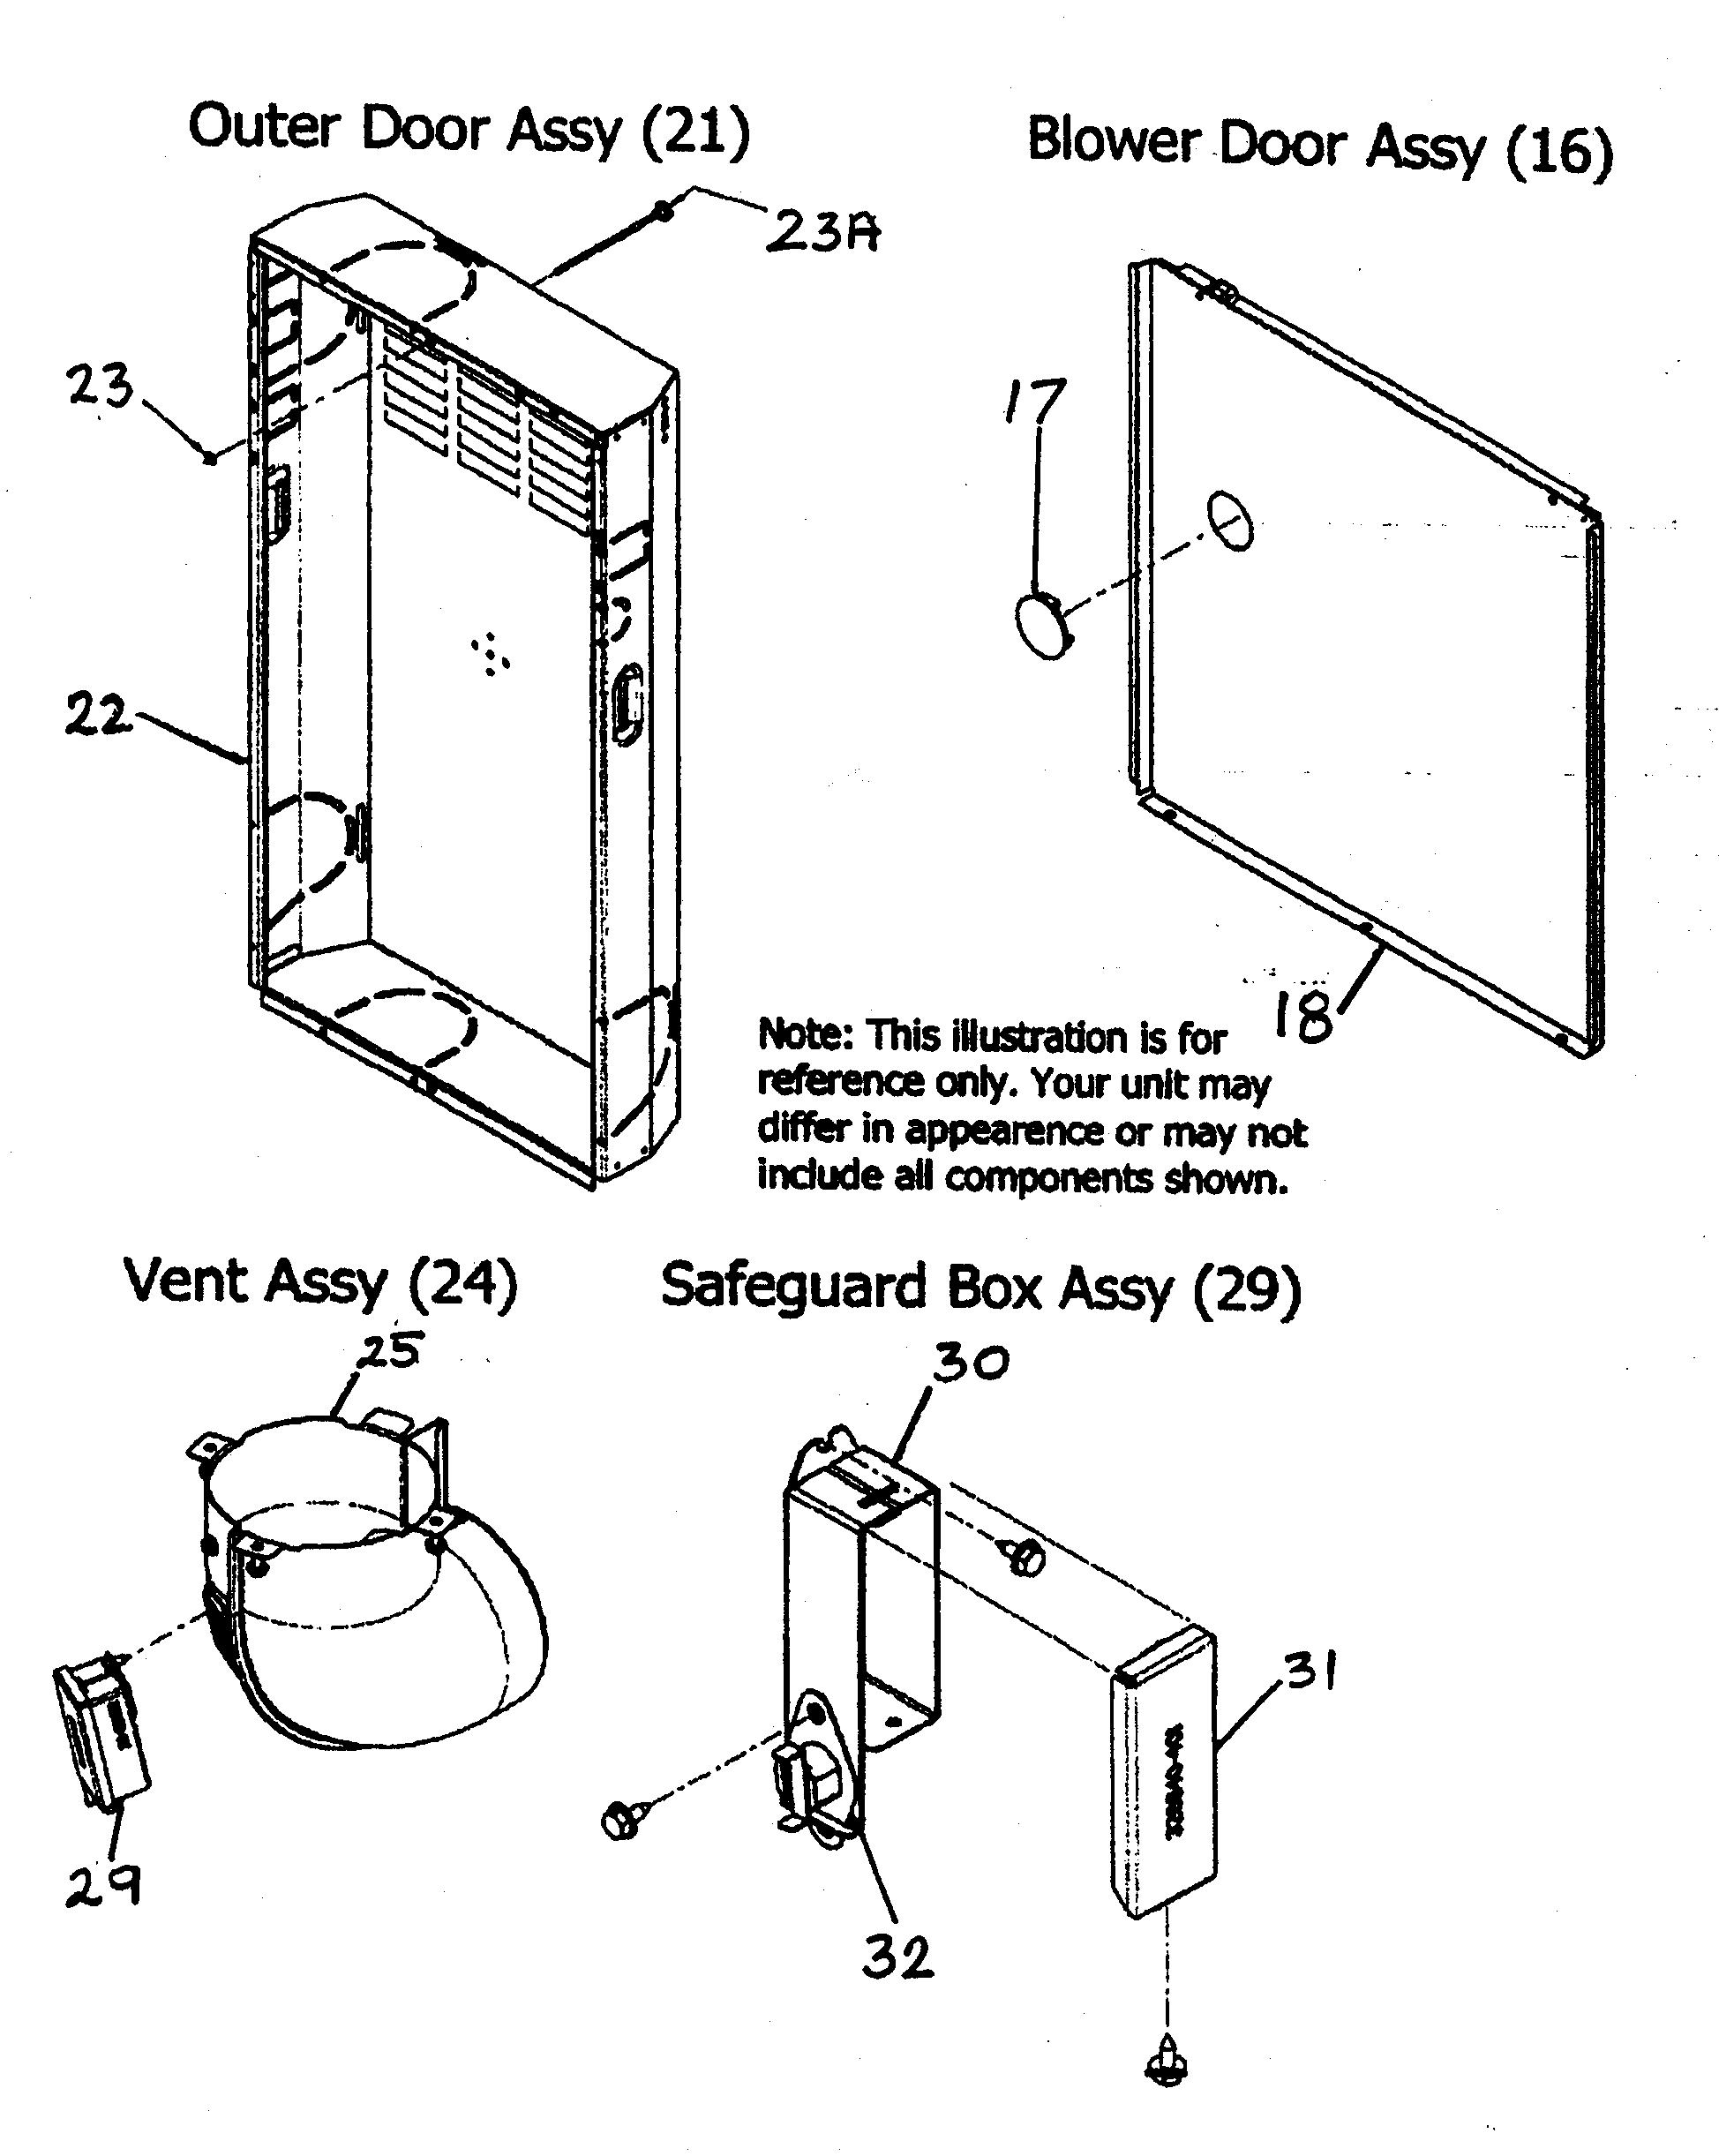 Payne  Furnace  Outer door/vent assy